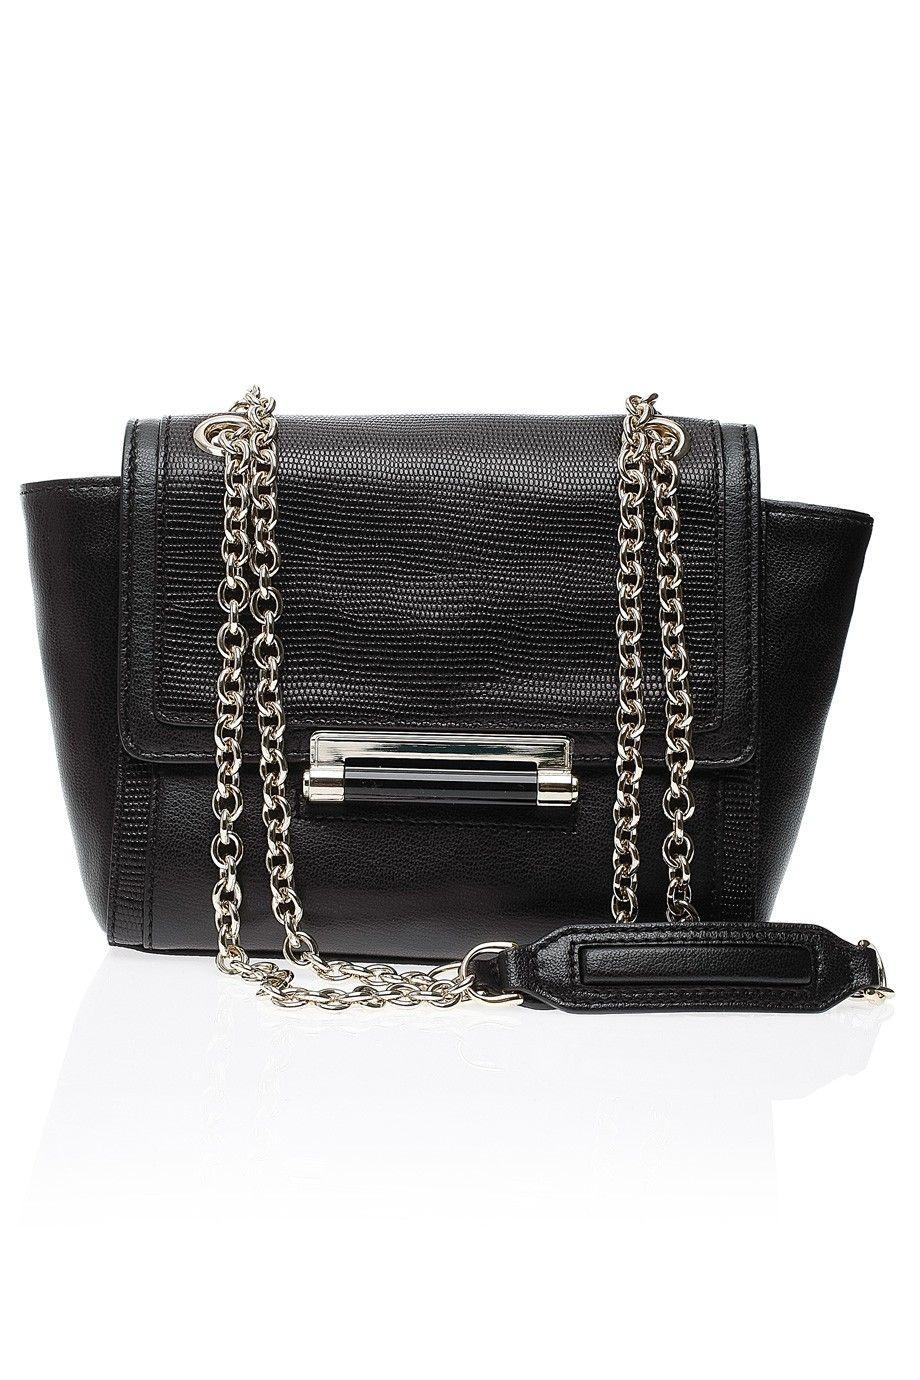 440 Mini Lizard Combo Bag By DIANE VON FURSTENBERG @ http://www.boutique1.com/